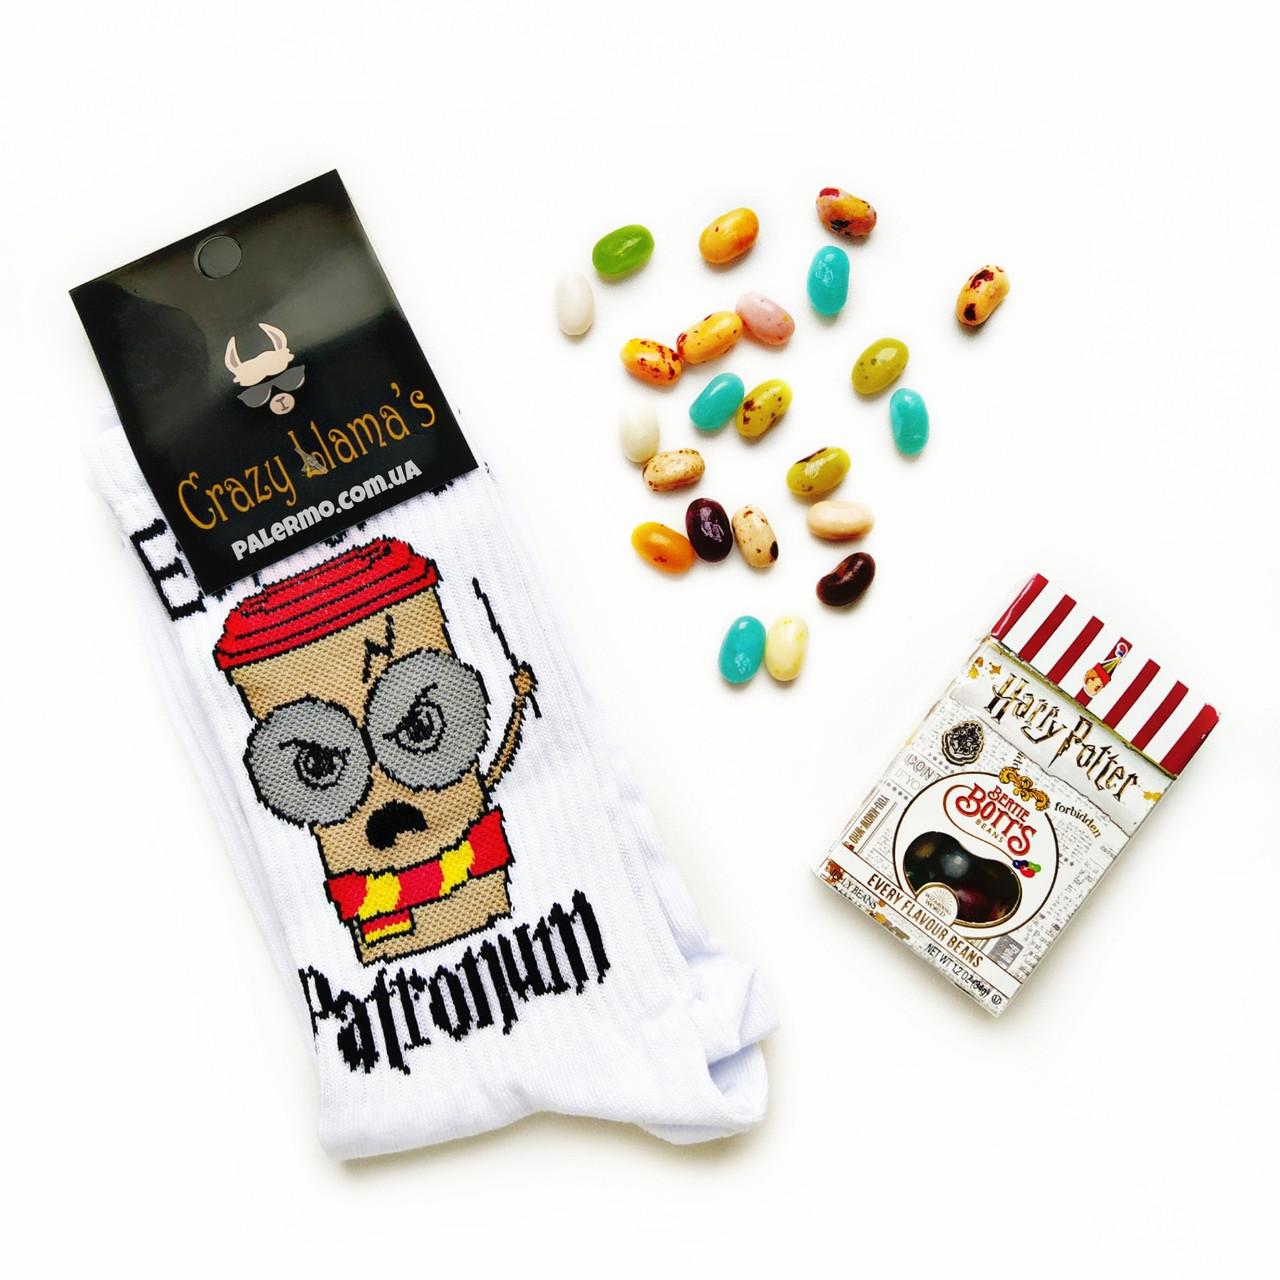 Набір Цукерки Гаррі Поттер Harry Potter 34г + Шкарпетки Еспресо Патронум Espresso Patronum